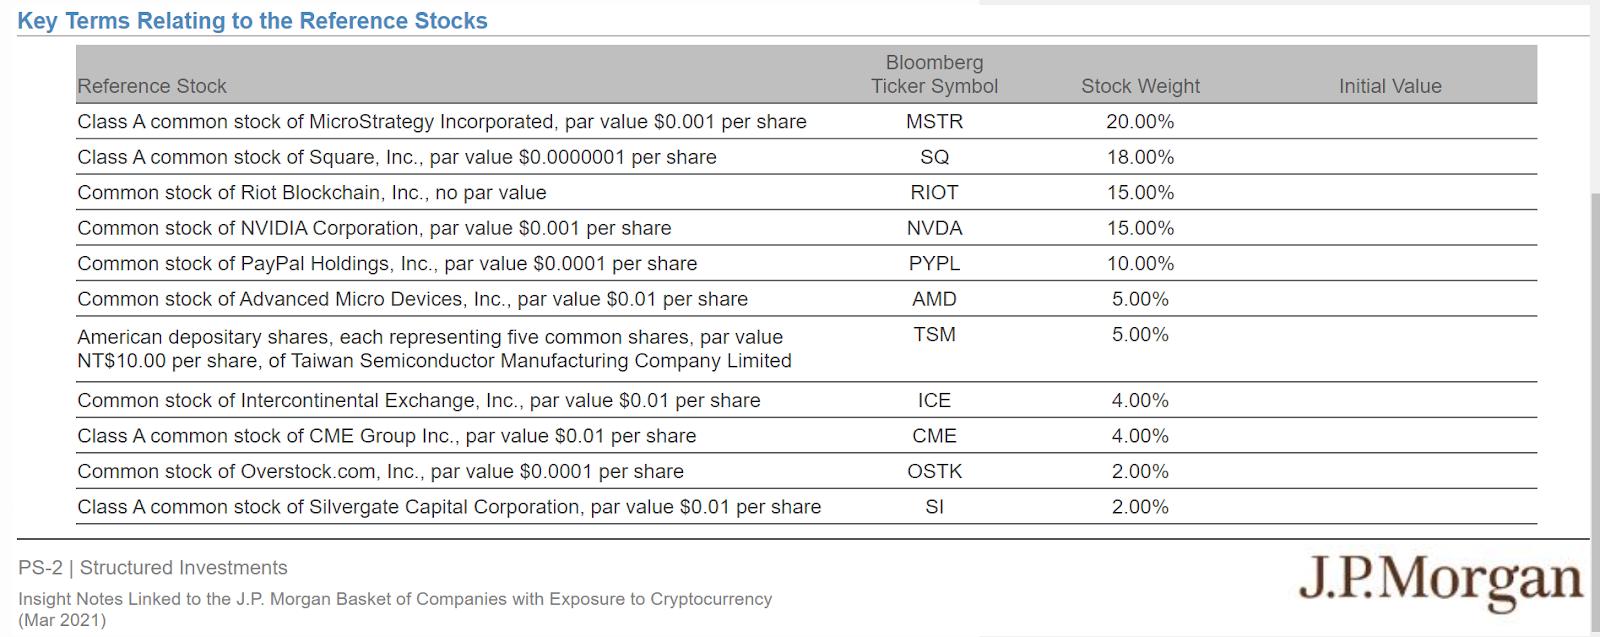 Список компаний из документации JPMorgan.